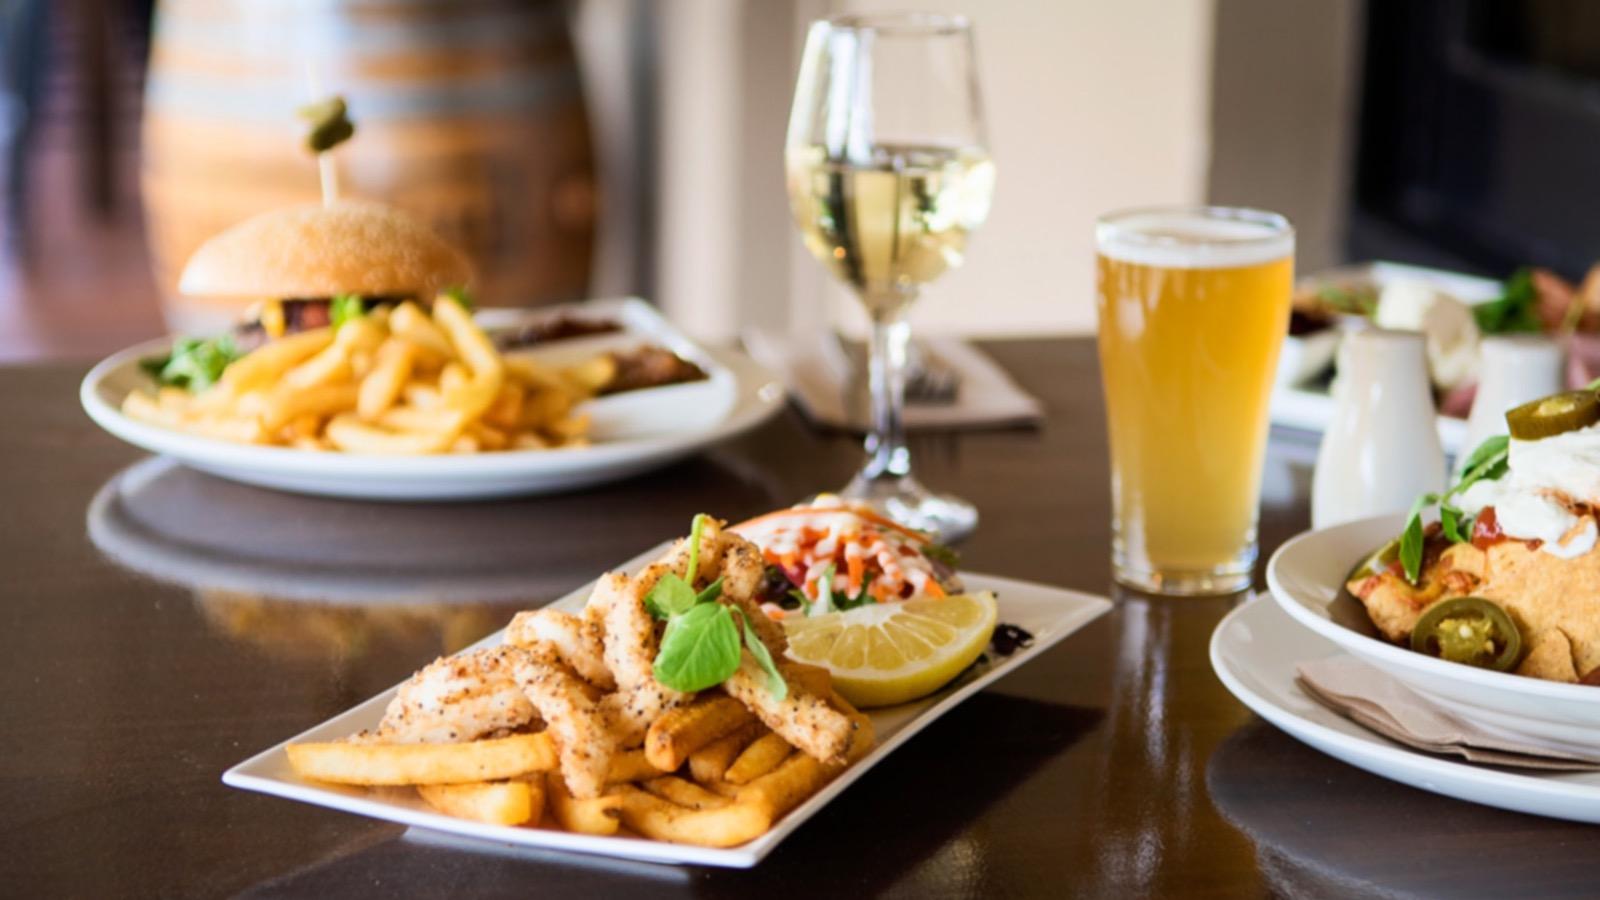 Salt and Pepper Calamaris, Angus Burger, Nachos, Wine and Craft Beer